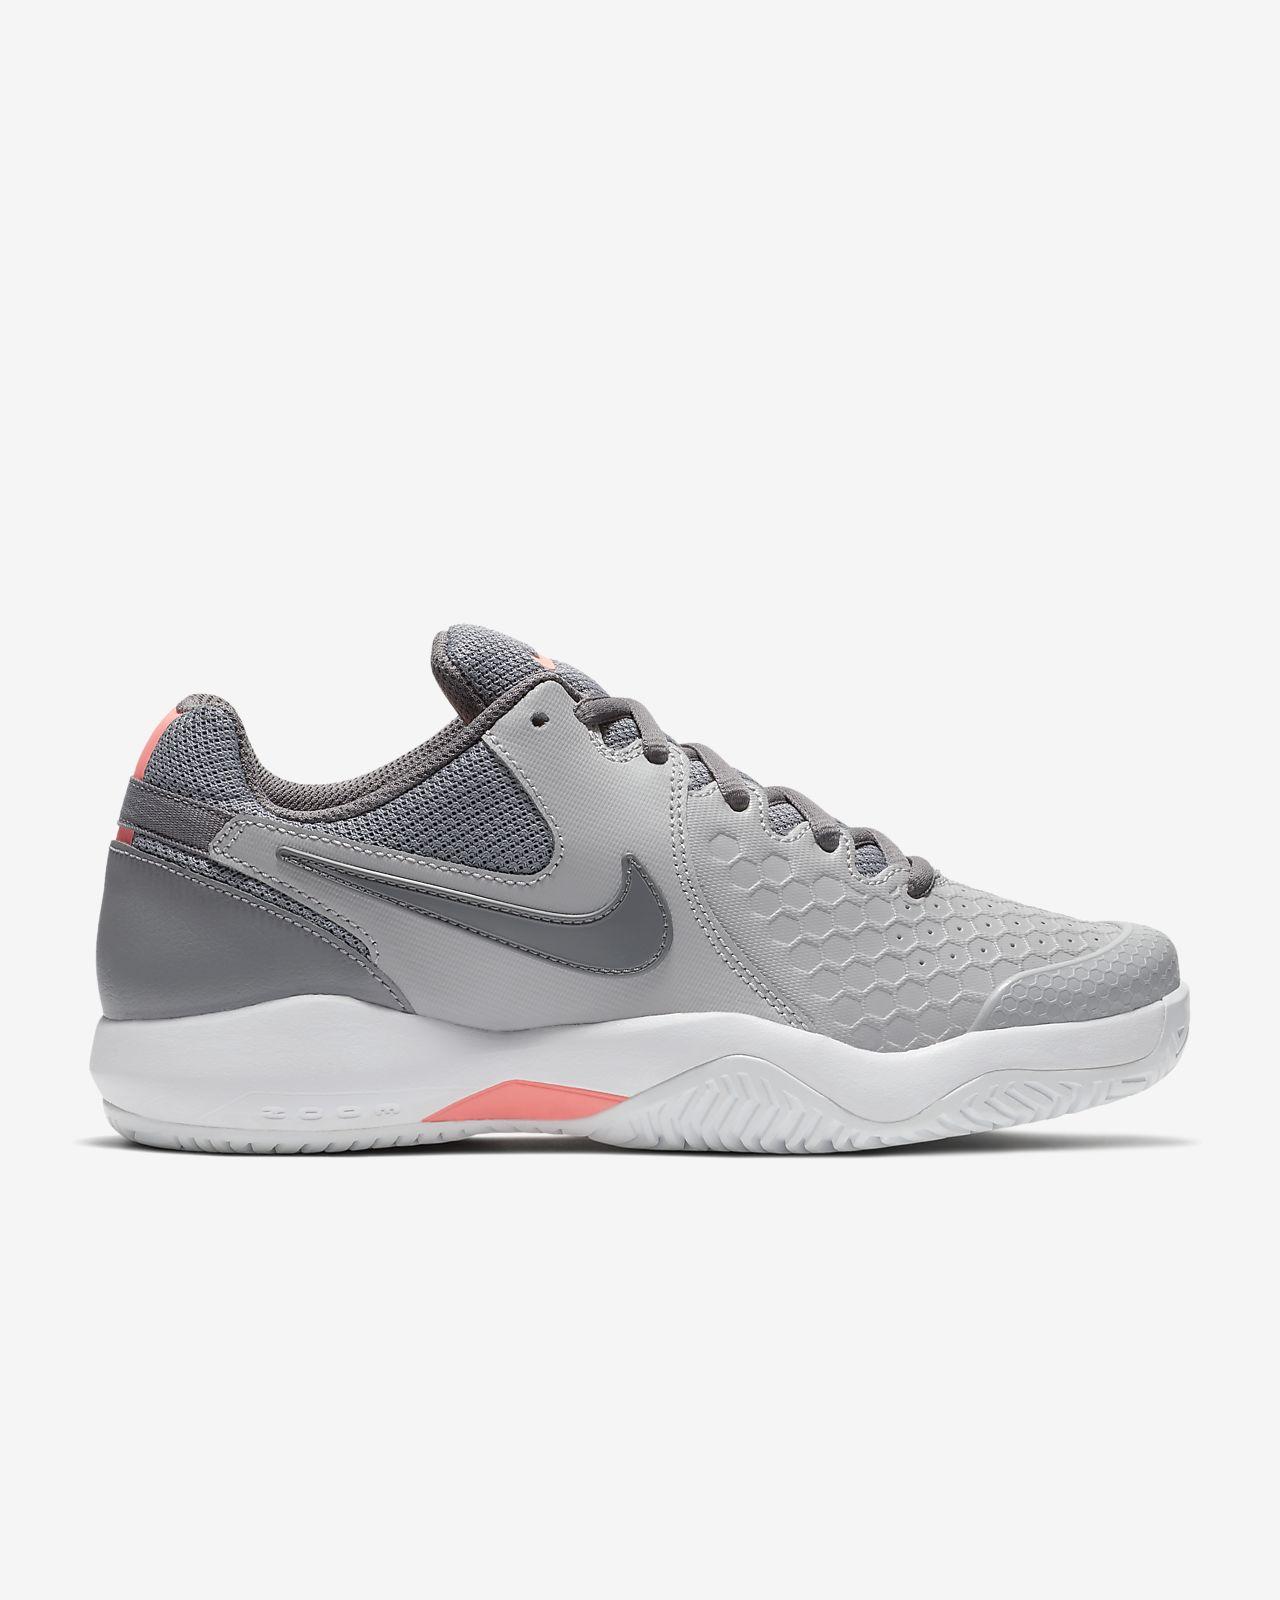 NIKECOURT AIR ZOOM RESISTANCE Womens Tennis Shoe 918201 013 Atmosphere Grey Lava Glow White Gunsmoke